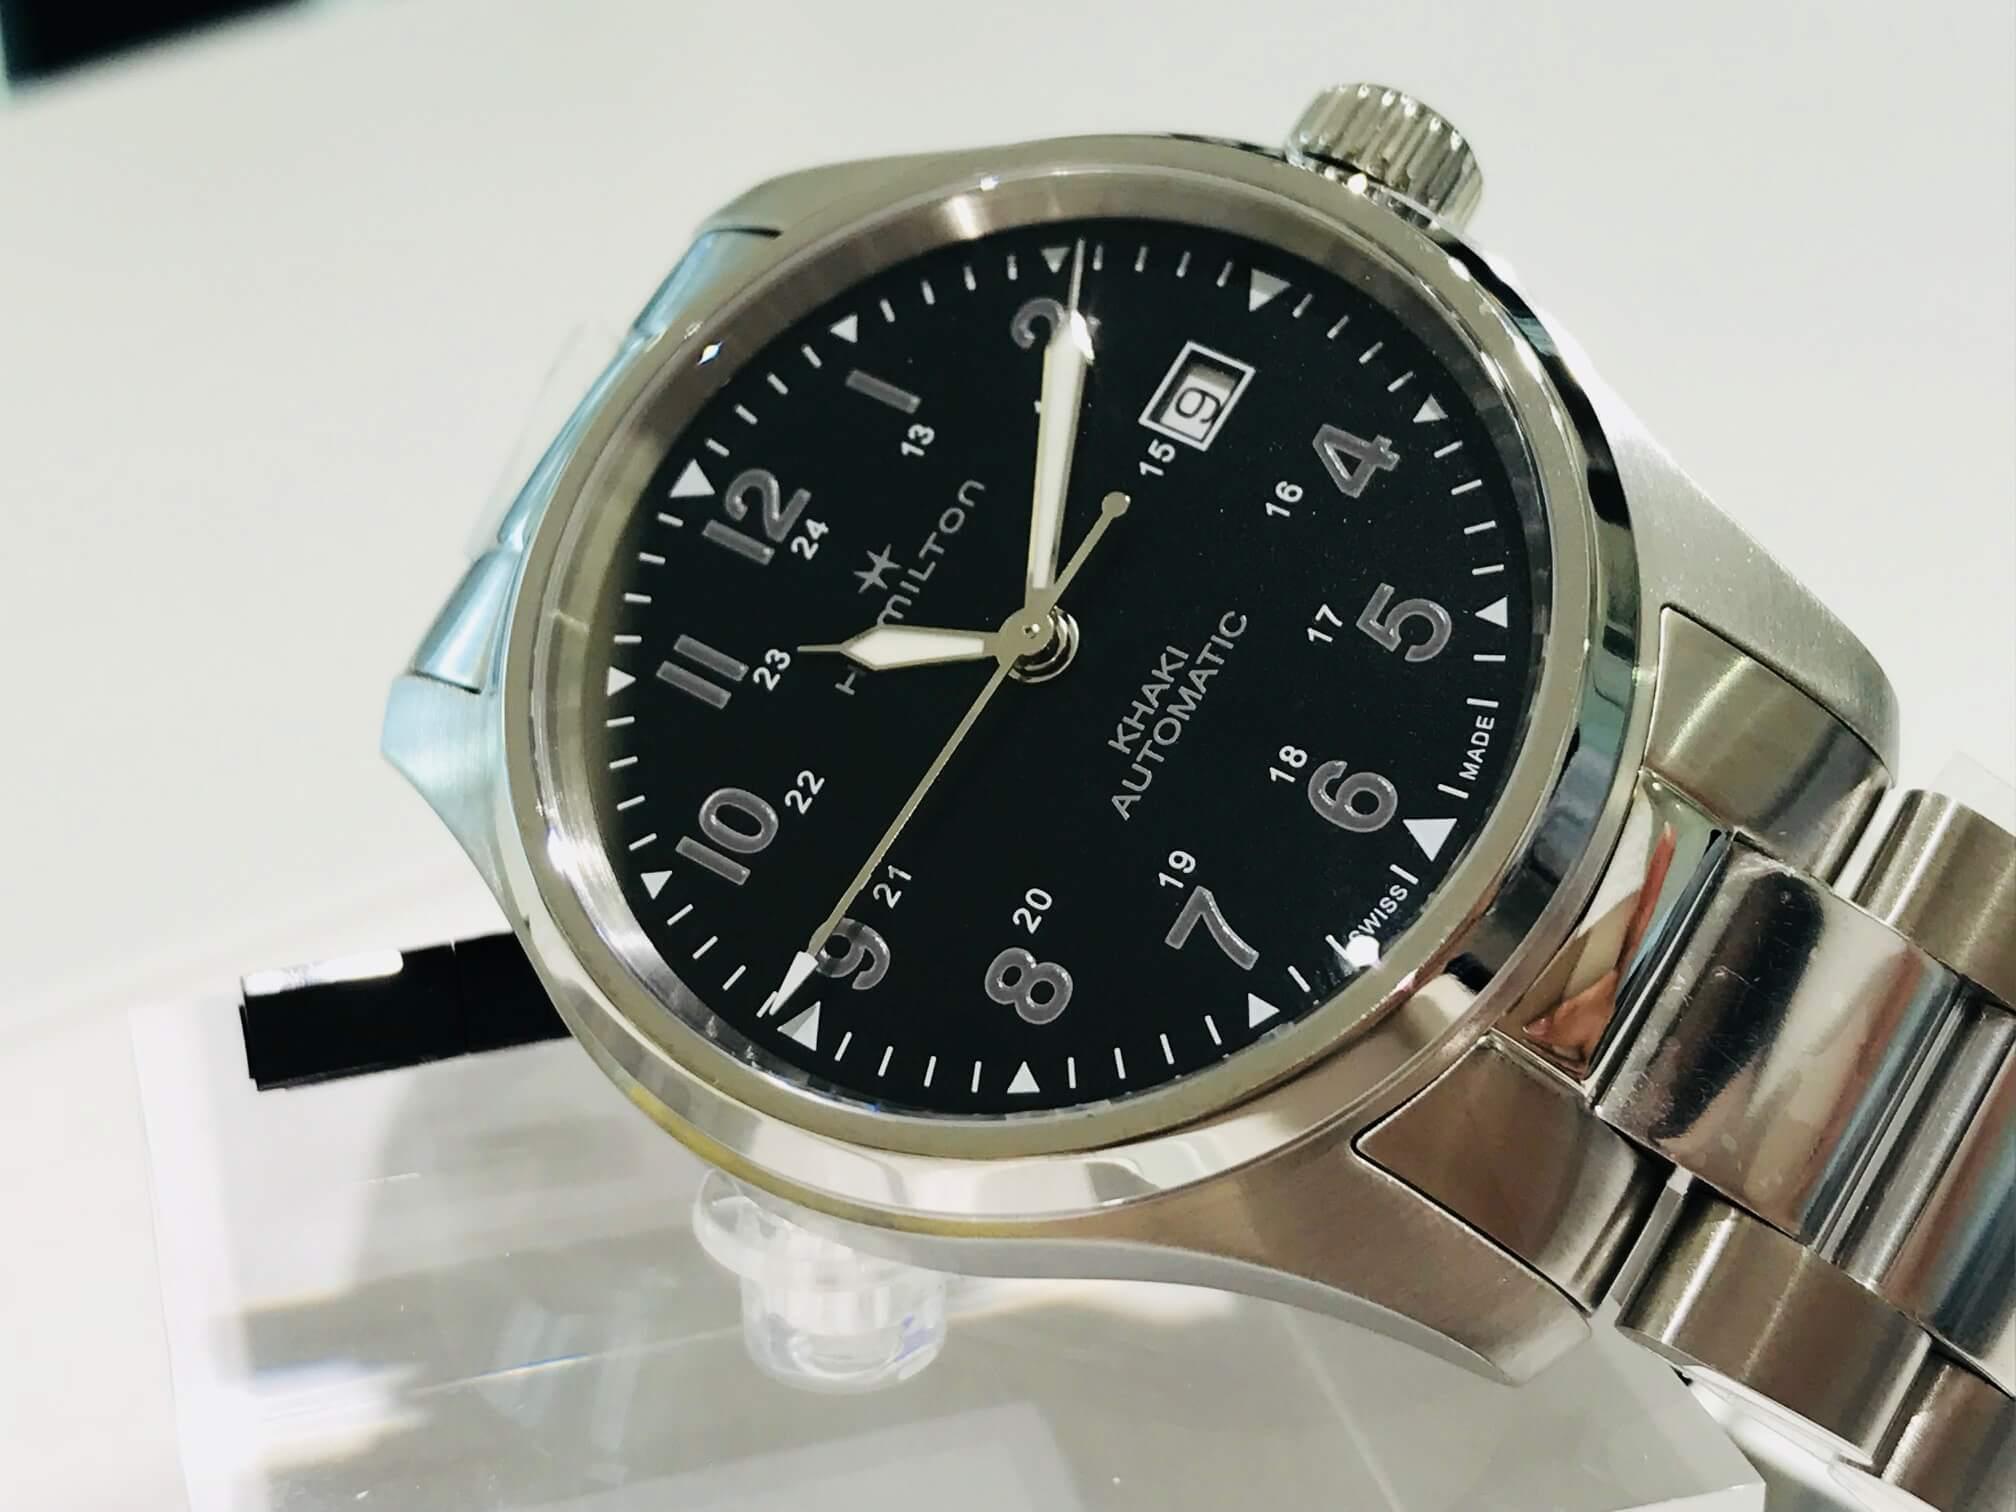 sale retailer af3da 16f35 コラボ | 精光堂 -SEIKODO- 輸入時計正規販売・高品質 ...